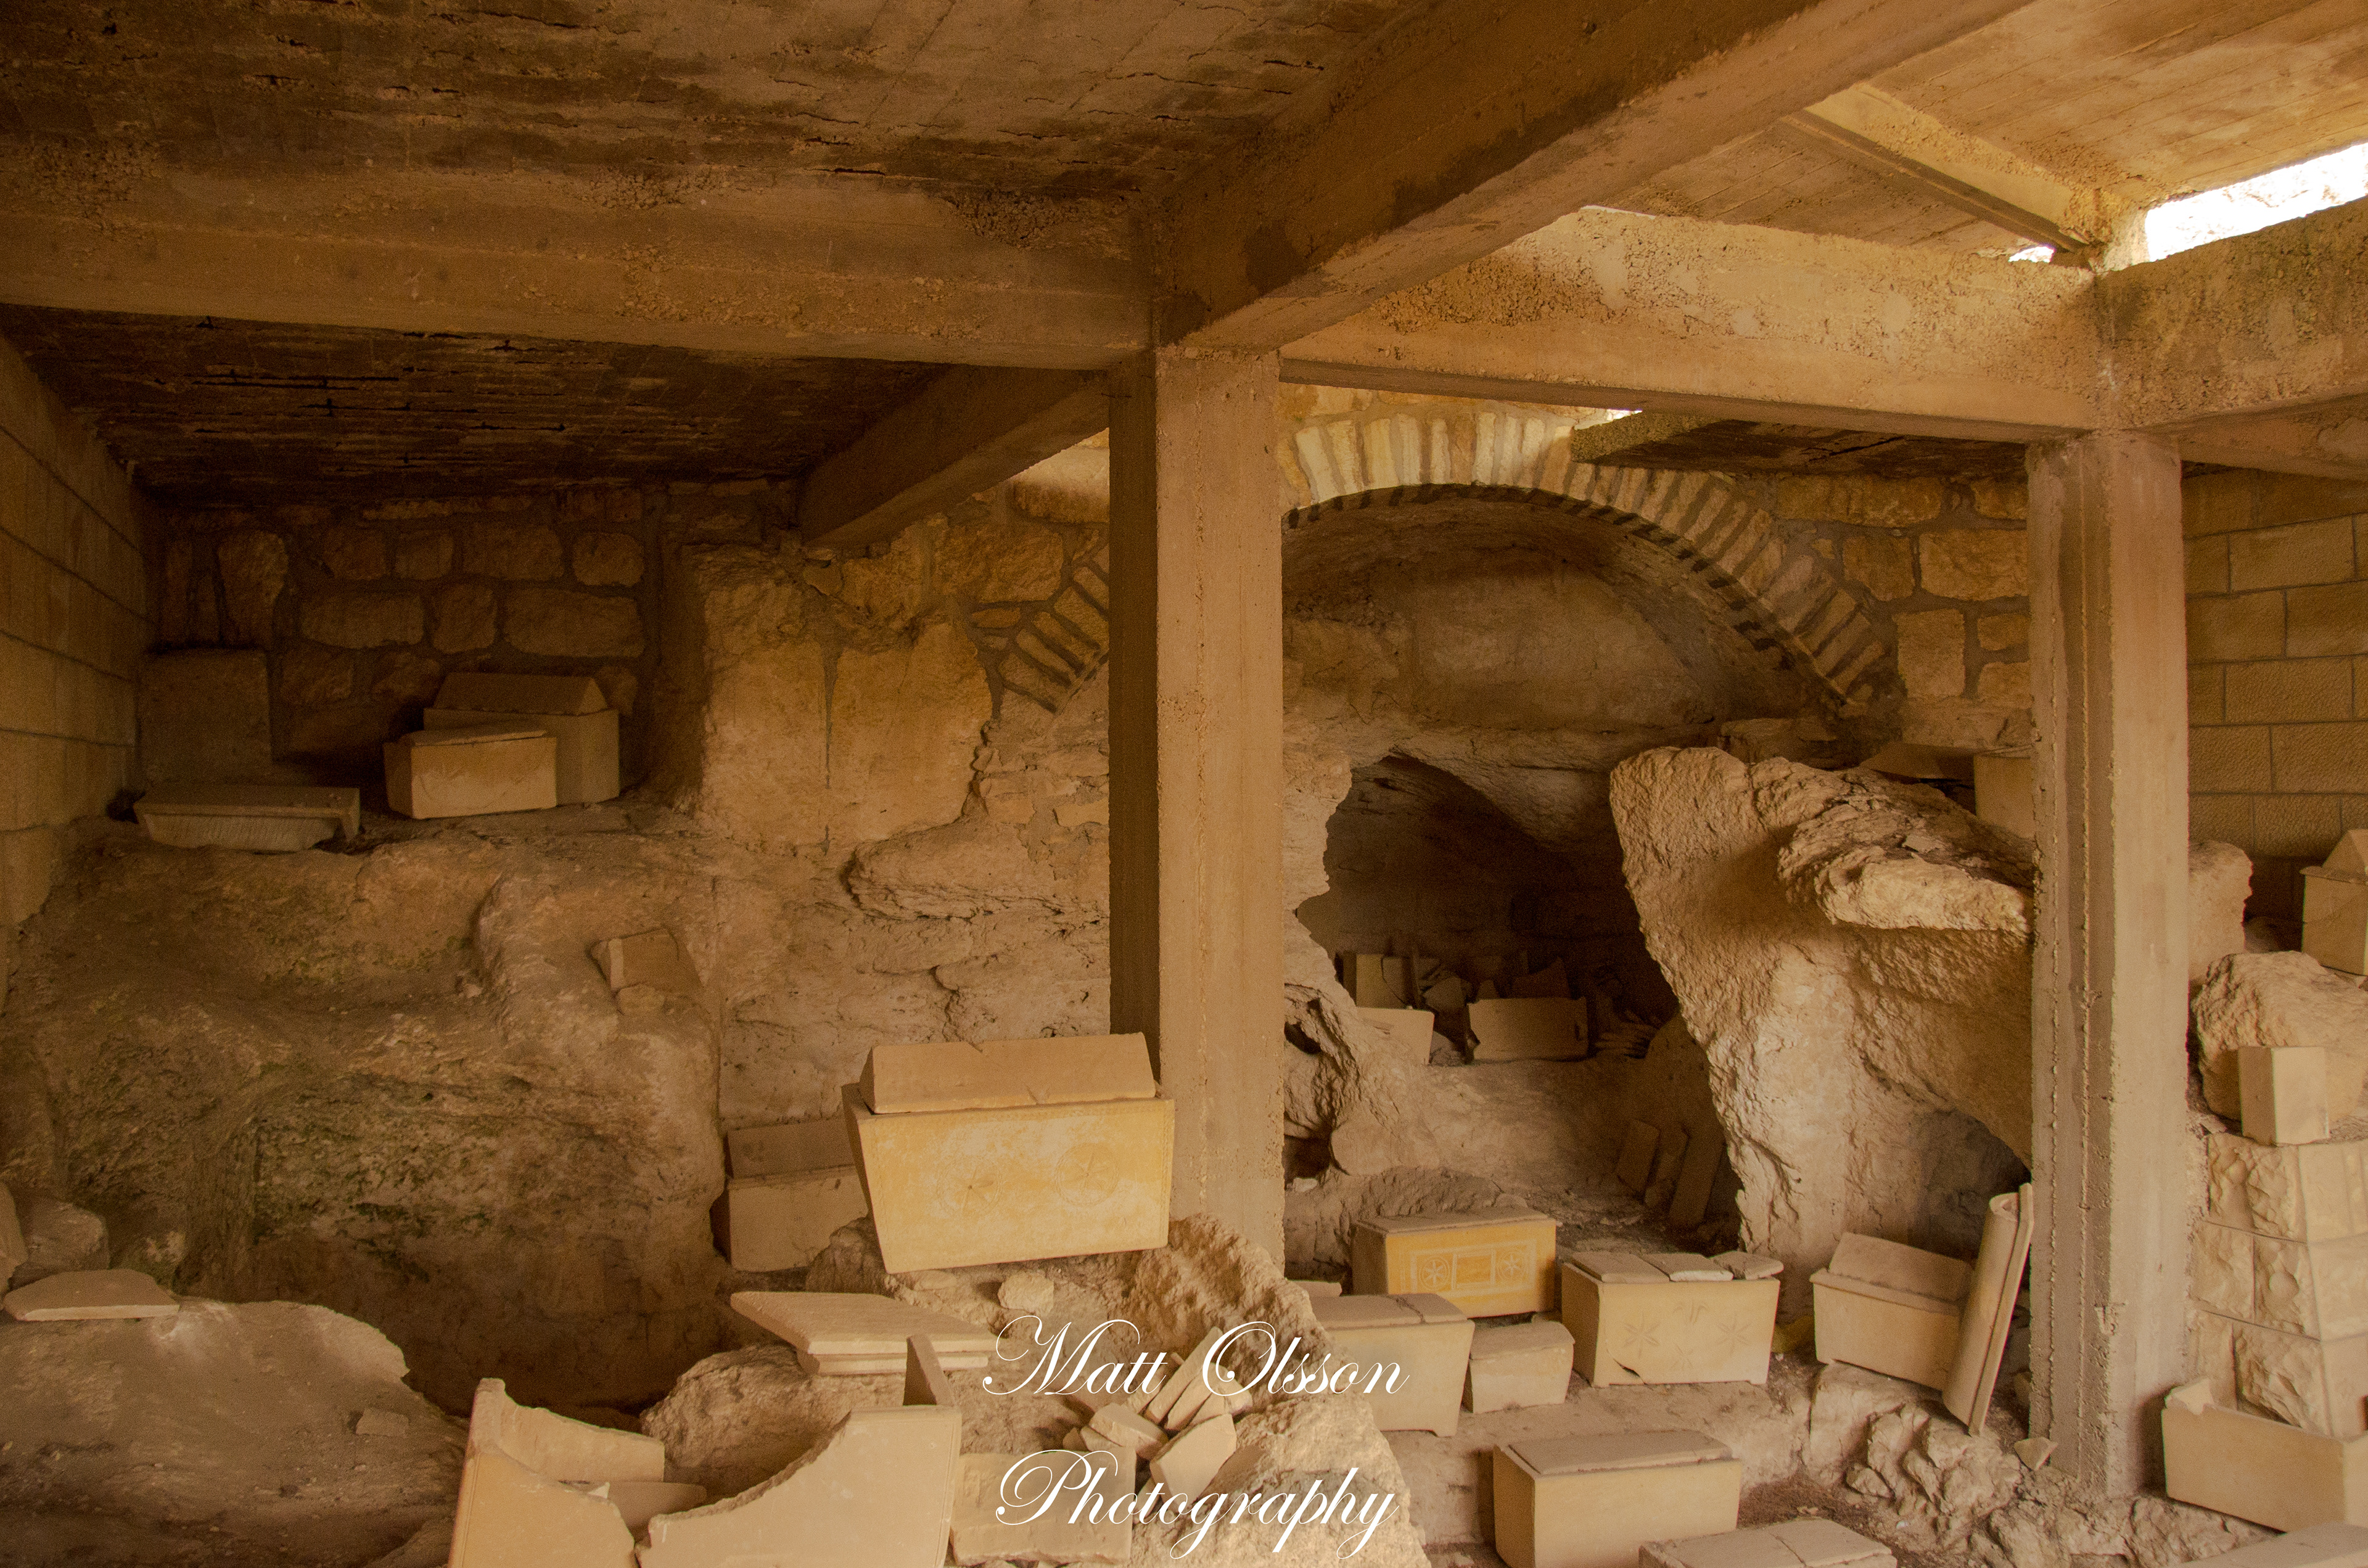 Matt Olsson - Mount of Olives, Garden of Gethsemane